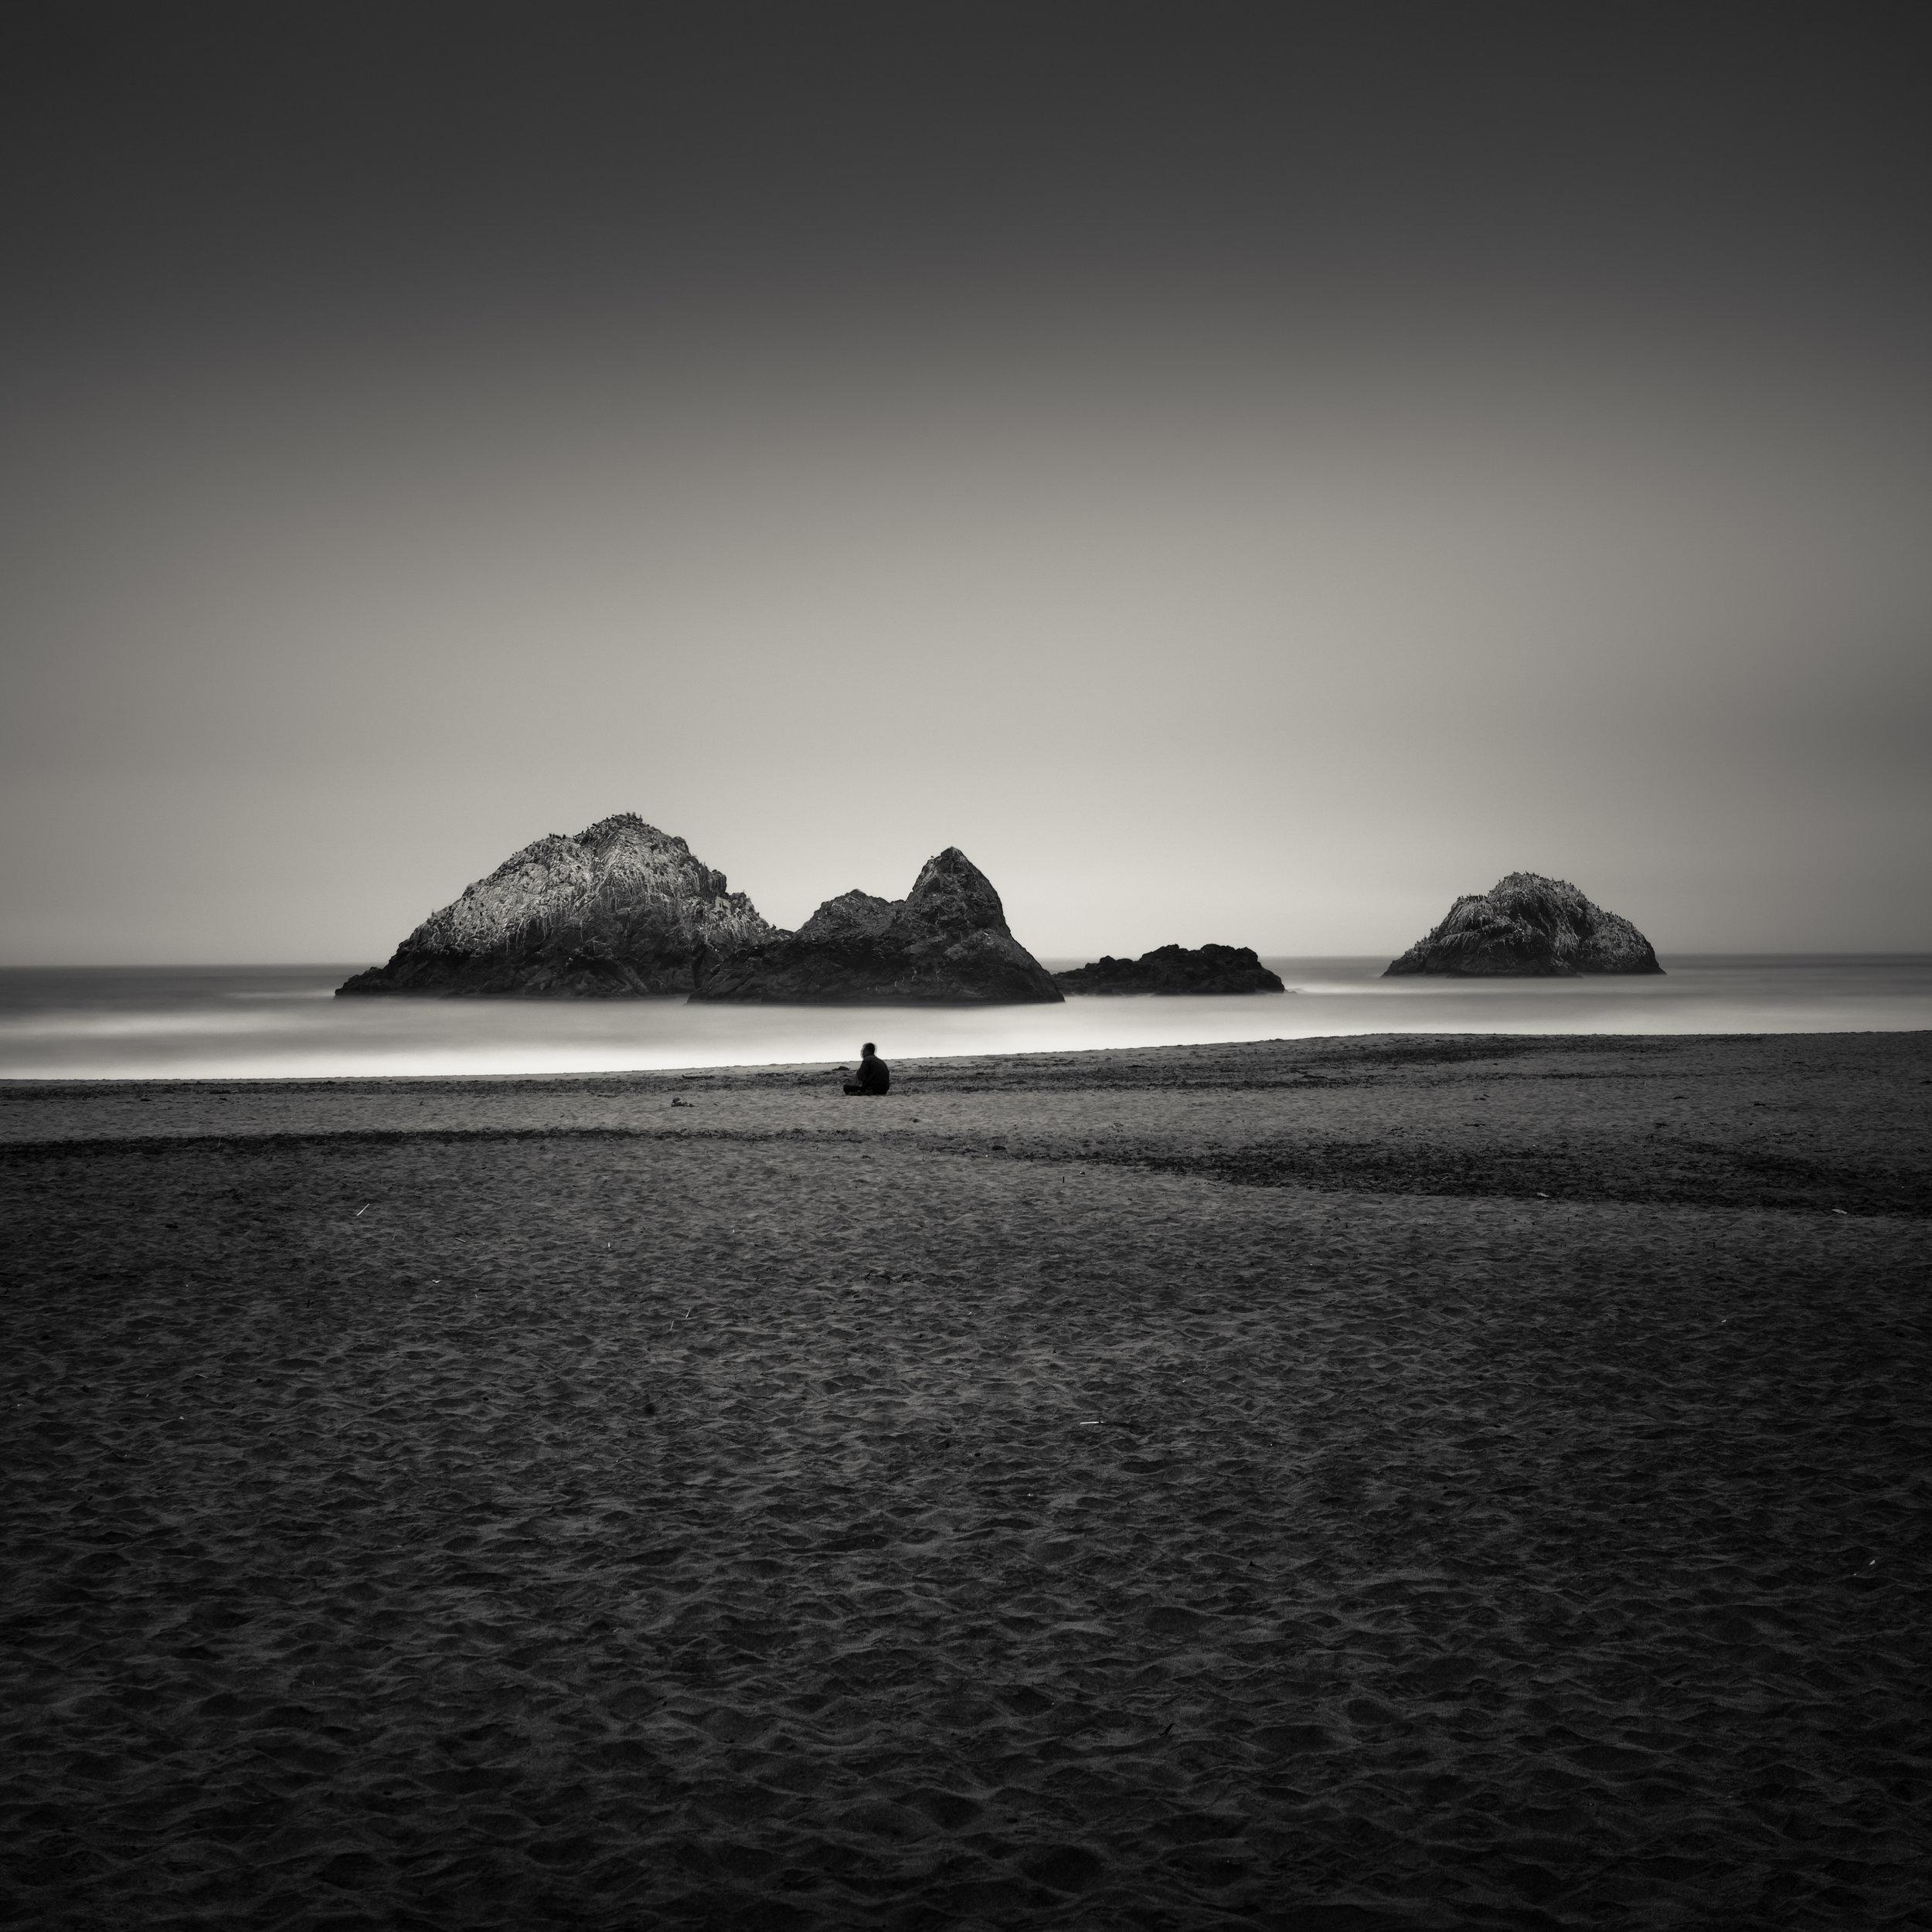 San Francisco black white sutro baths beach sole figure meditation awareness calm